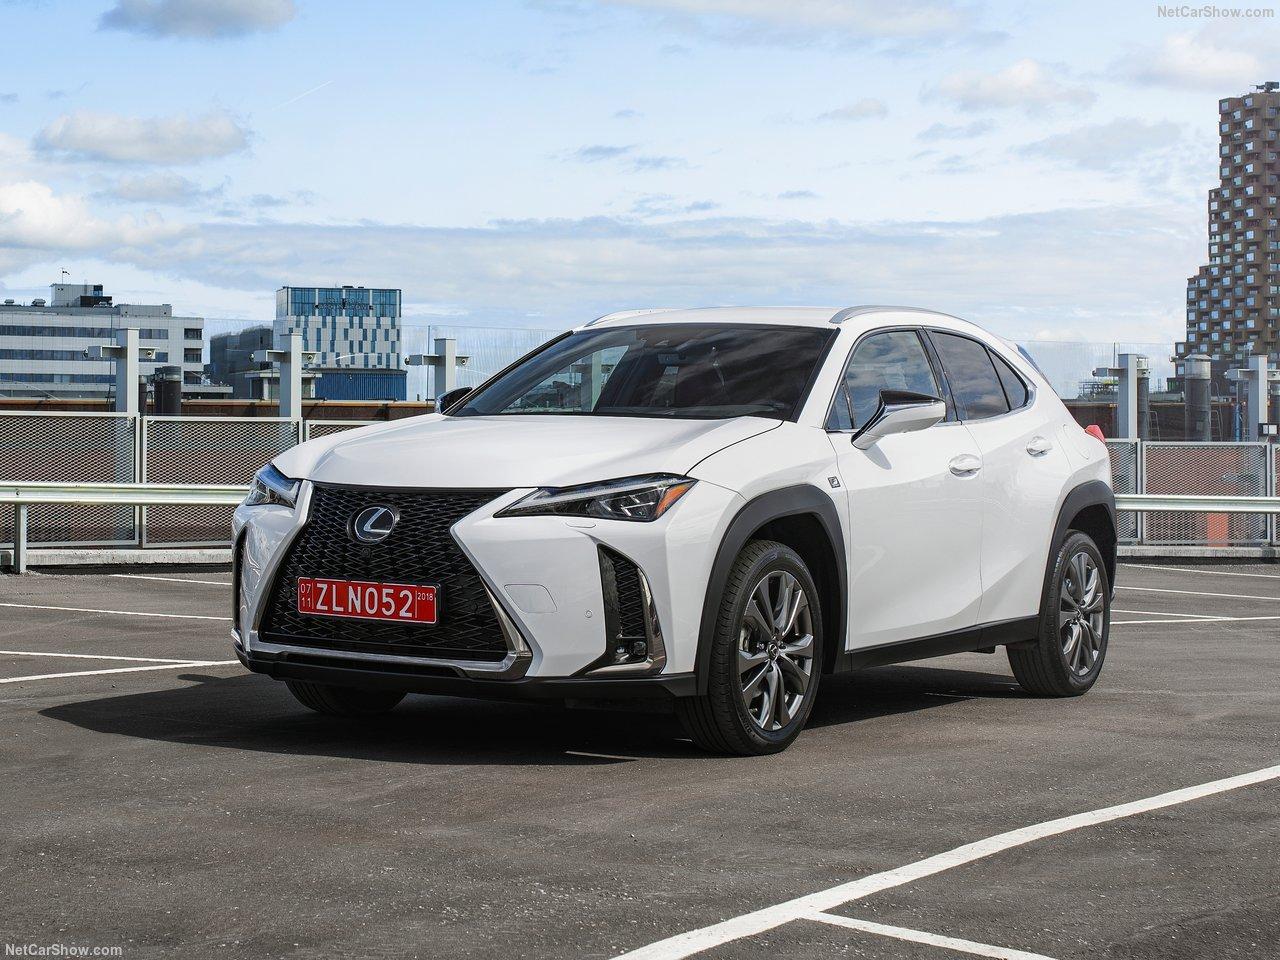 Lexus-UX-2019-1280-01_201808291334488e7.jpg